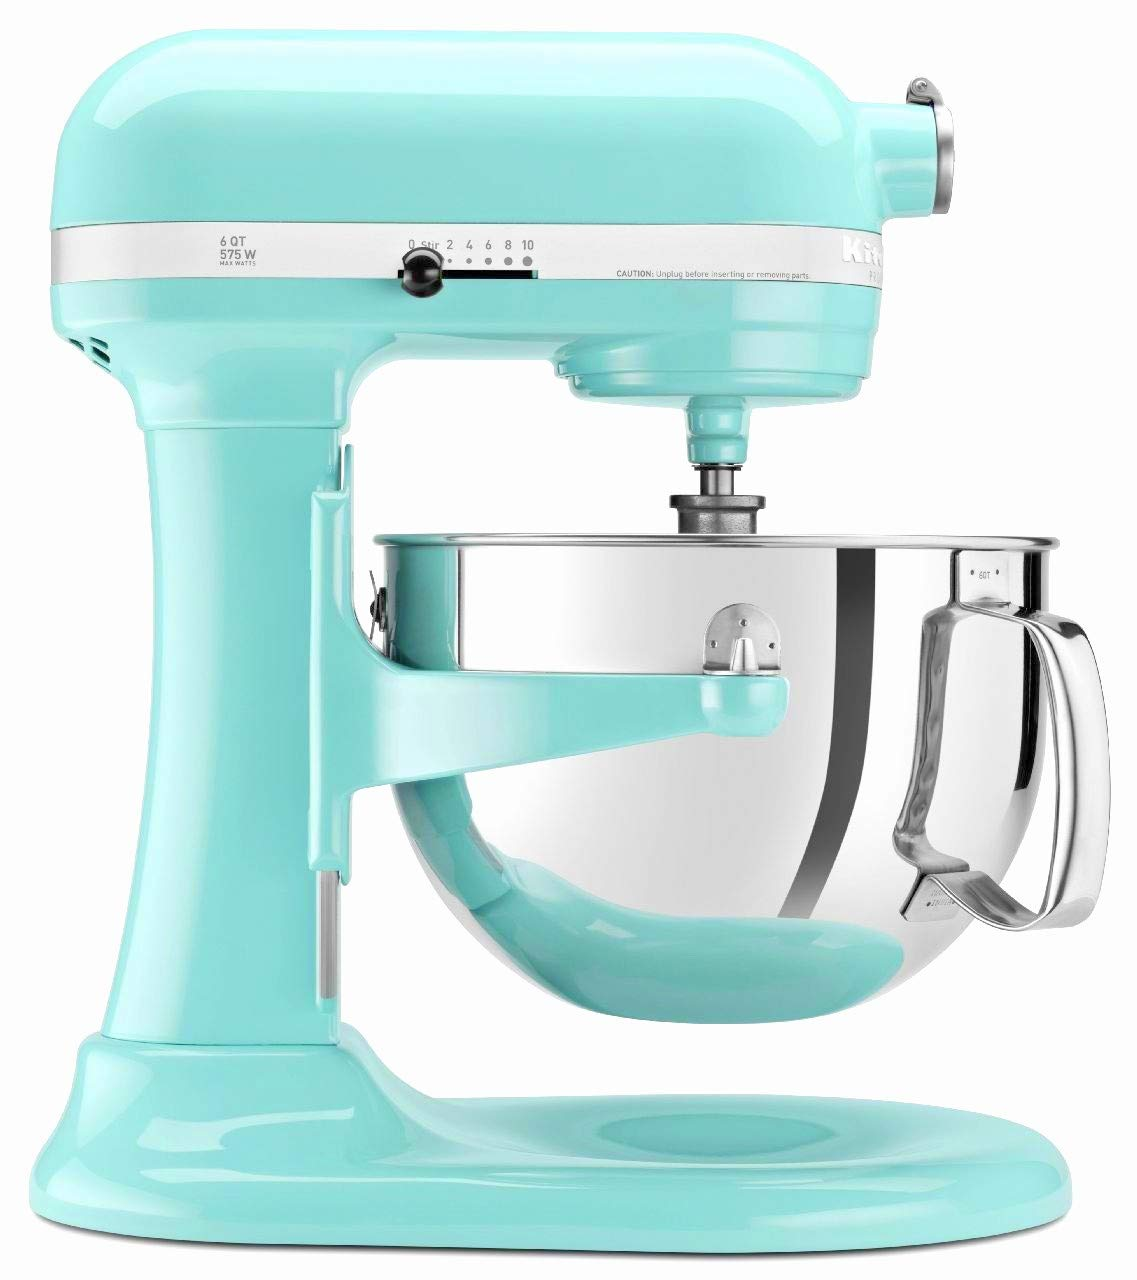 KitchenAid Professional 600 Stand Mixer 6 quart, Ice (Renewed) by KitchenAid